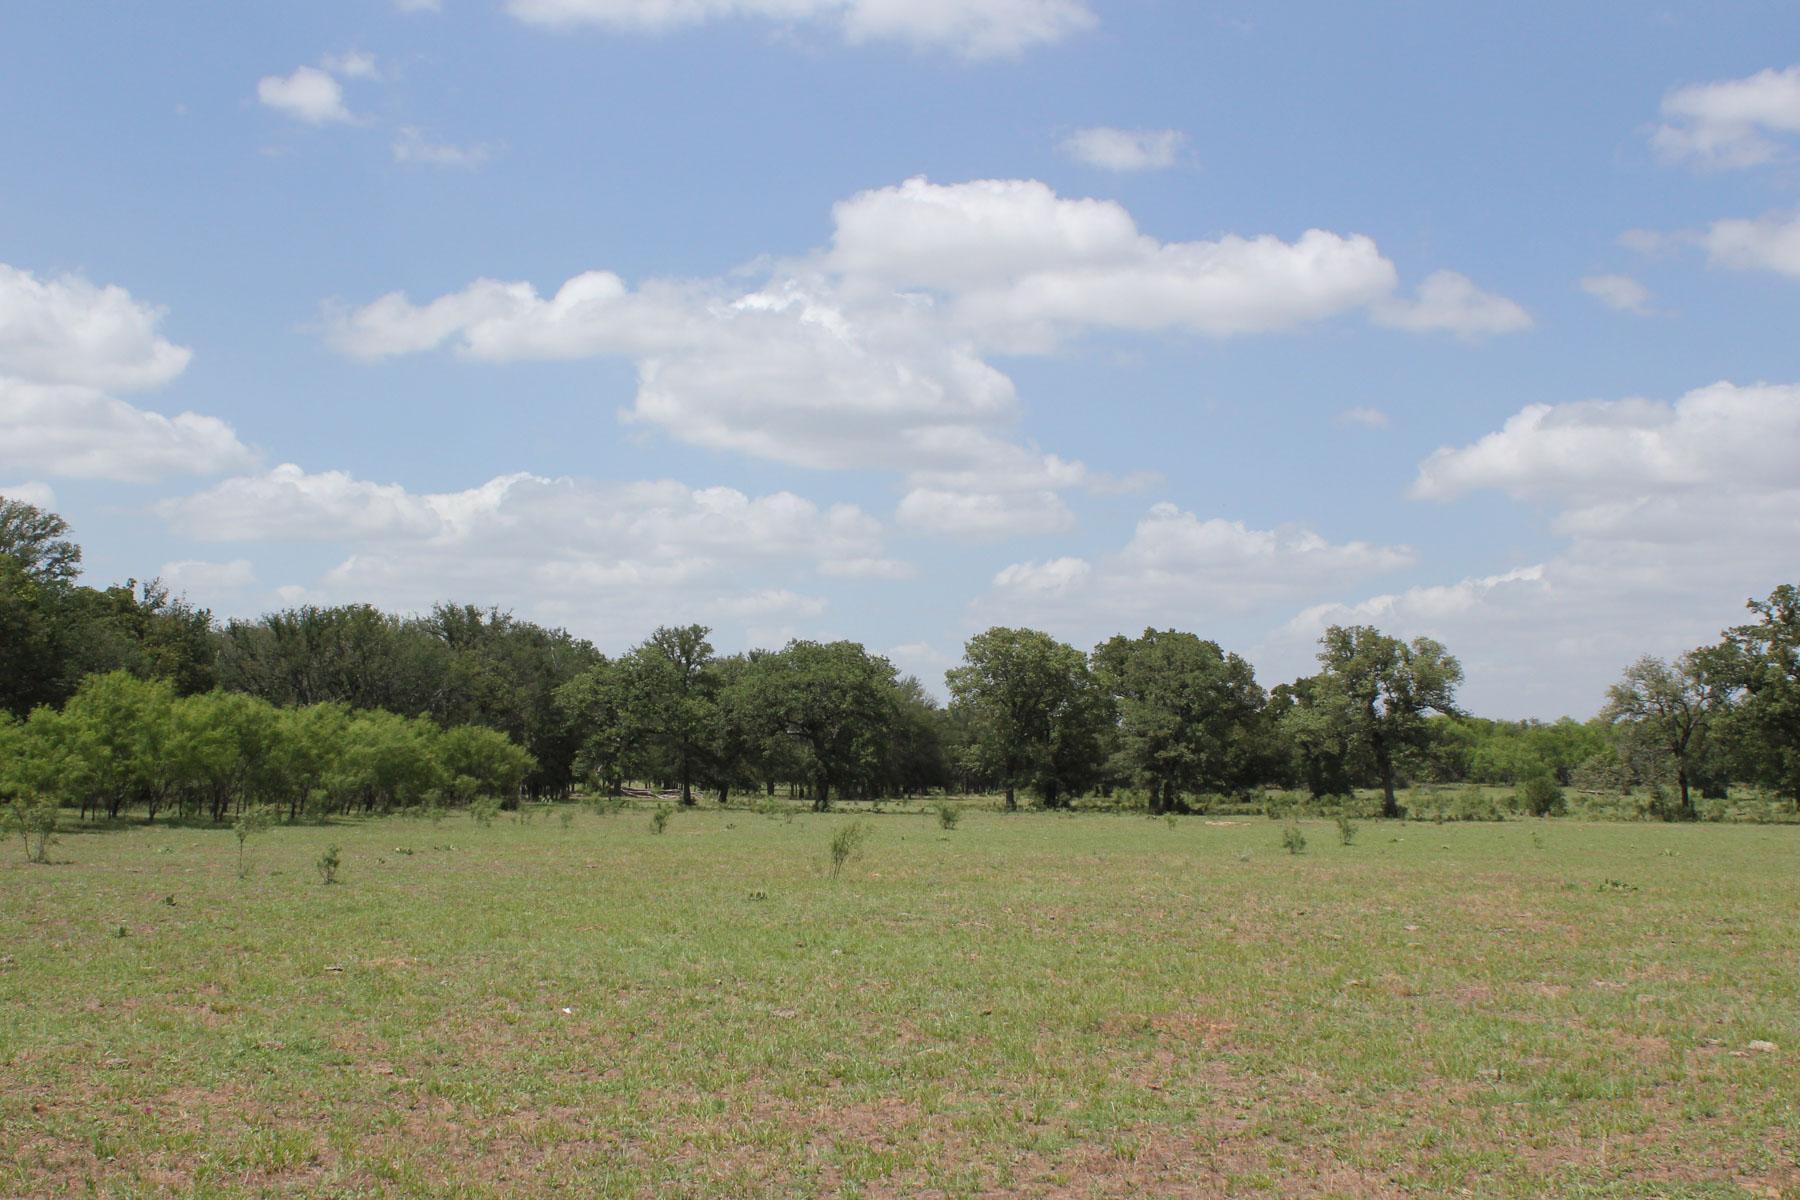 Đất đai vì Bán tại 15378 Co Rd 136 Parcel 2, Gordon Gordon, Texas, 76453 Hoa Kỳ